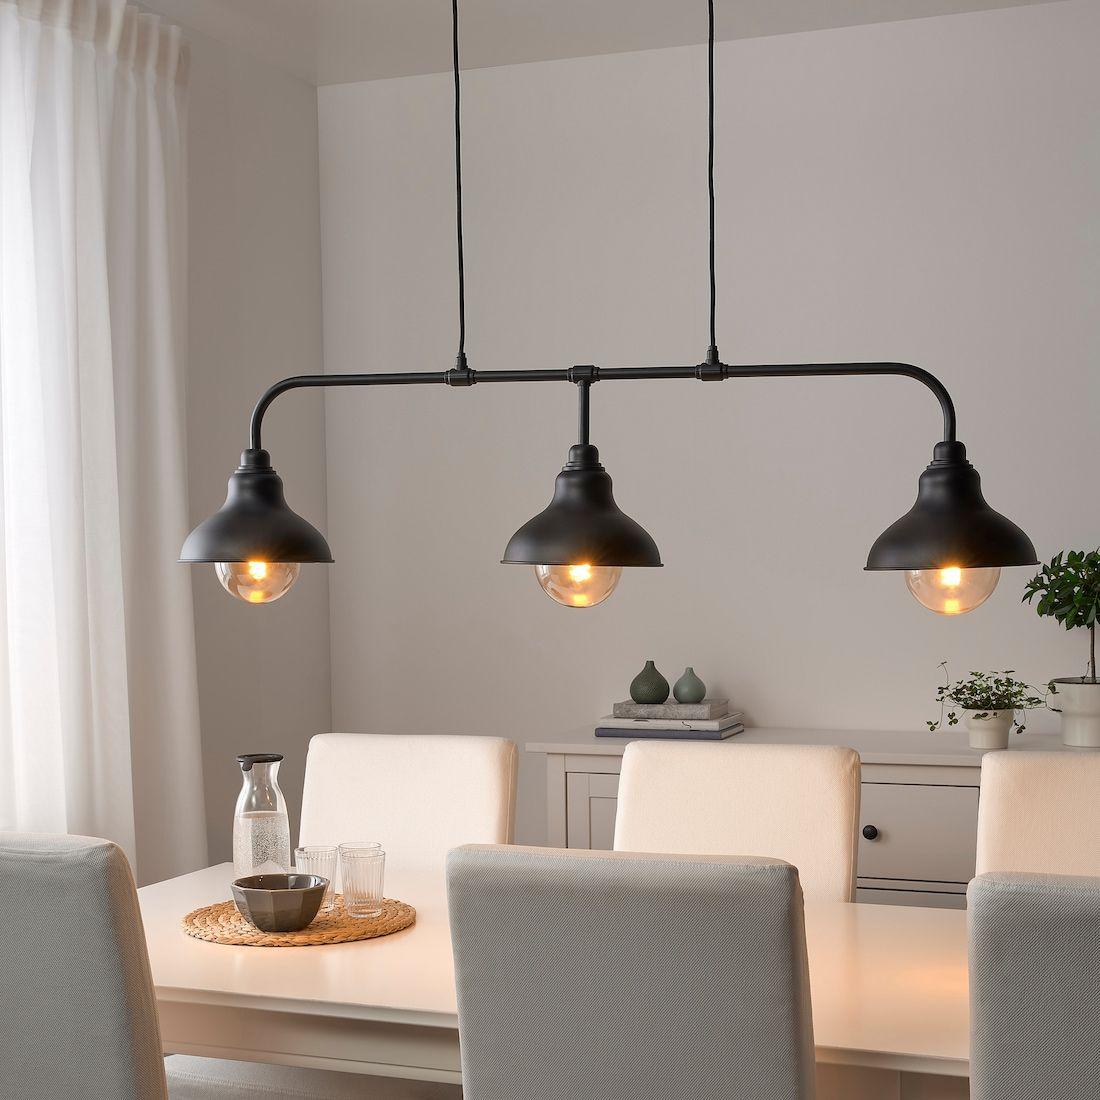 Agunnaryd Plafondlamp Met 3 Lampen Zwart Ikea In 2020 Black Lamps Dining Room Trends Lamp